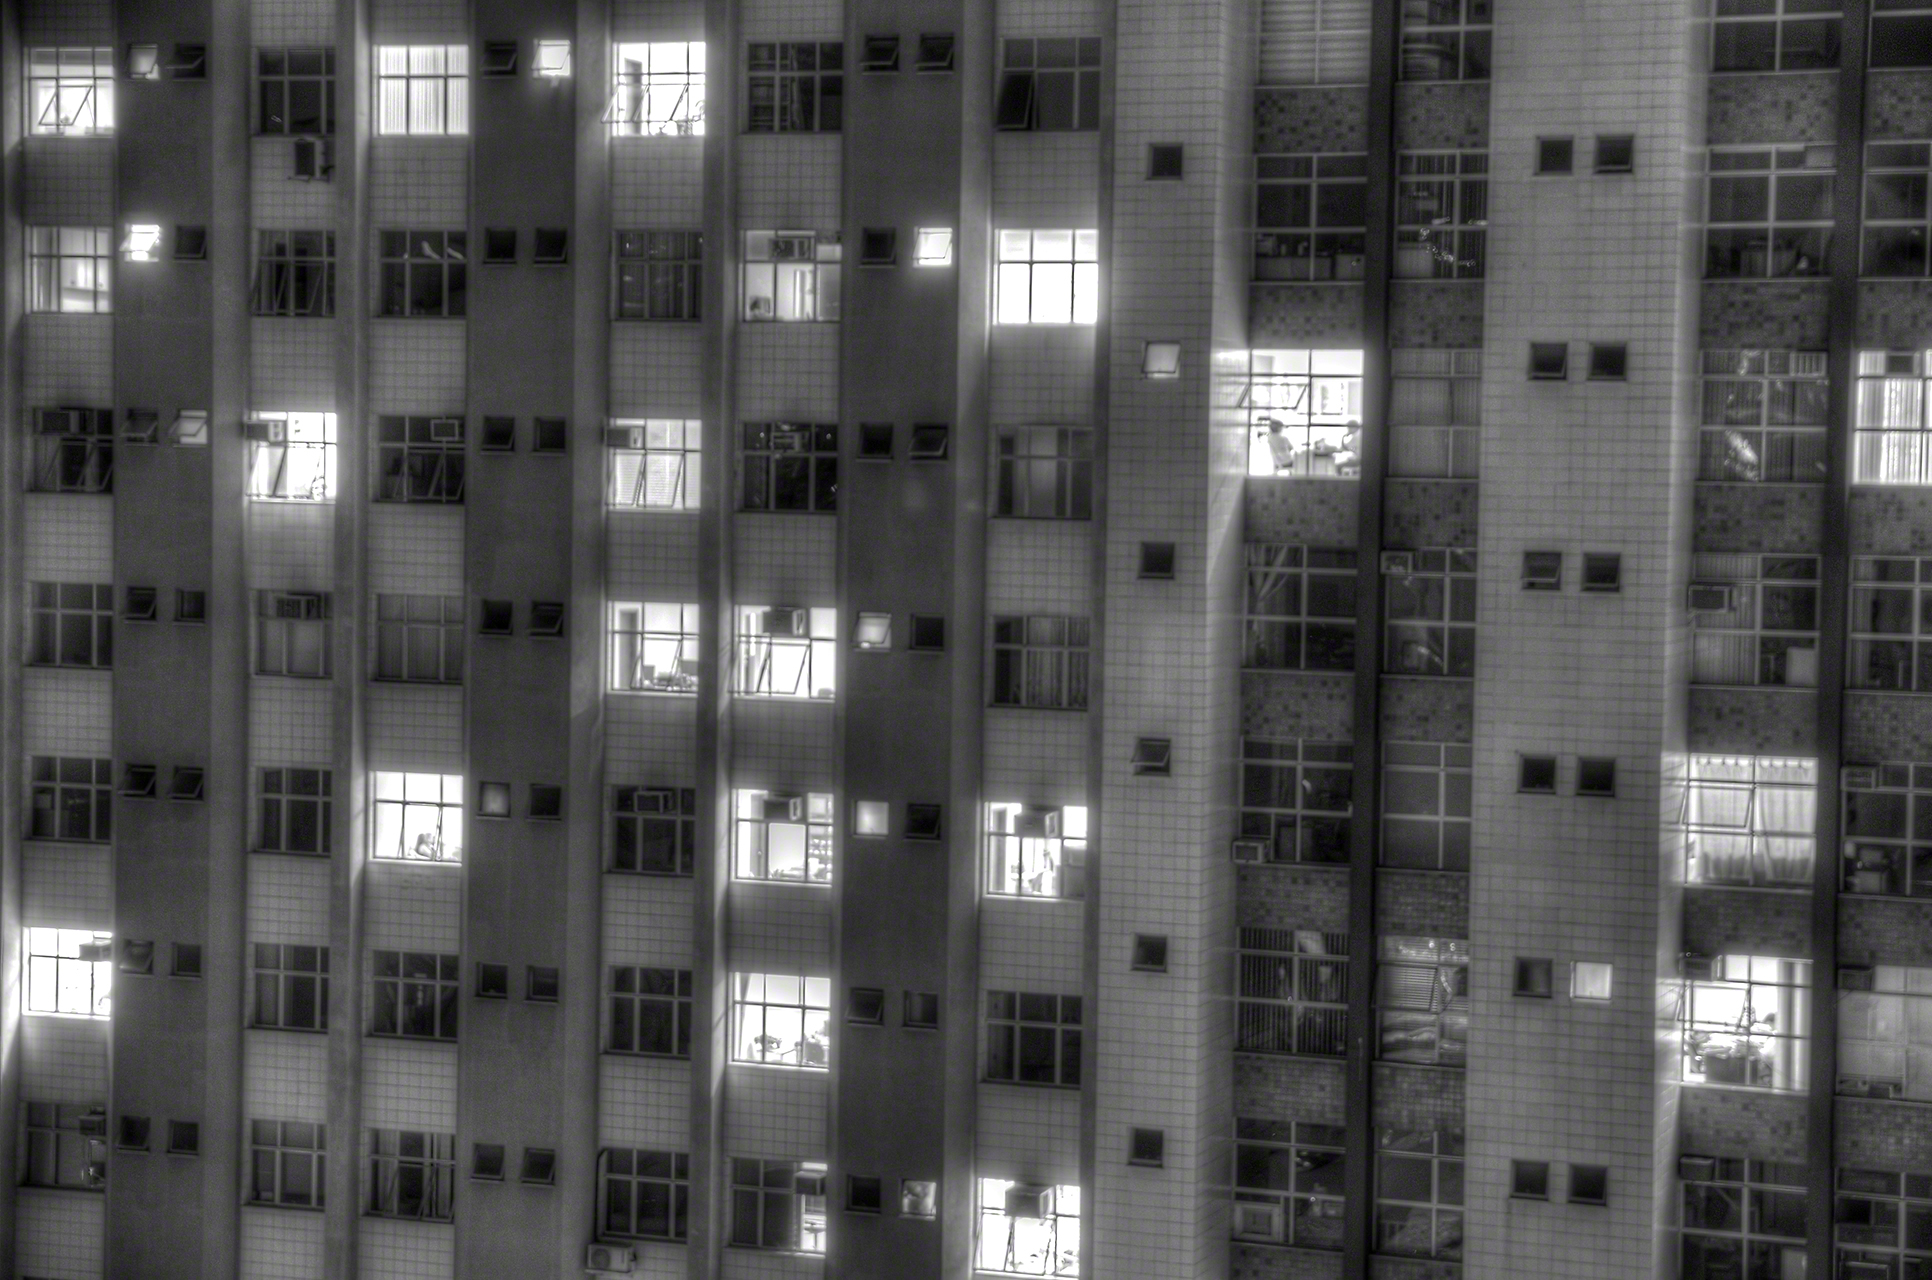 Apartment complex at night, Belo Hoizonte, Brazil